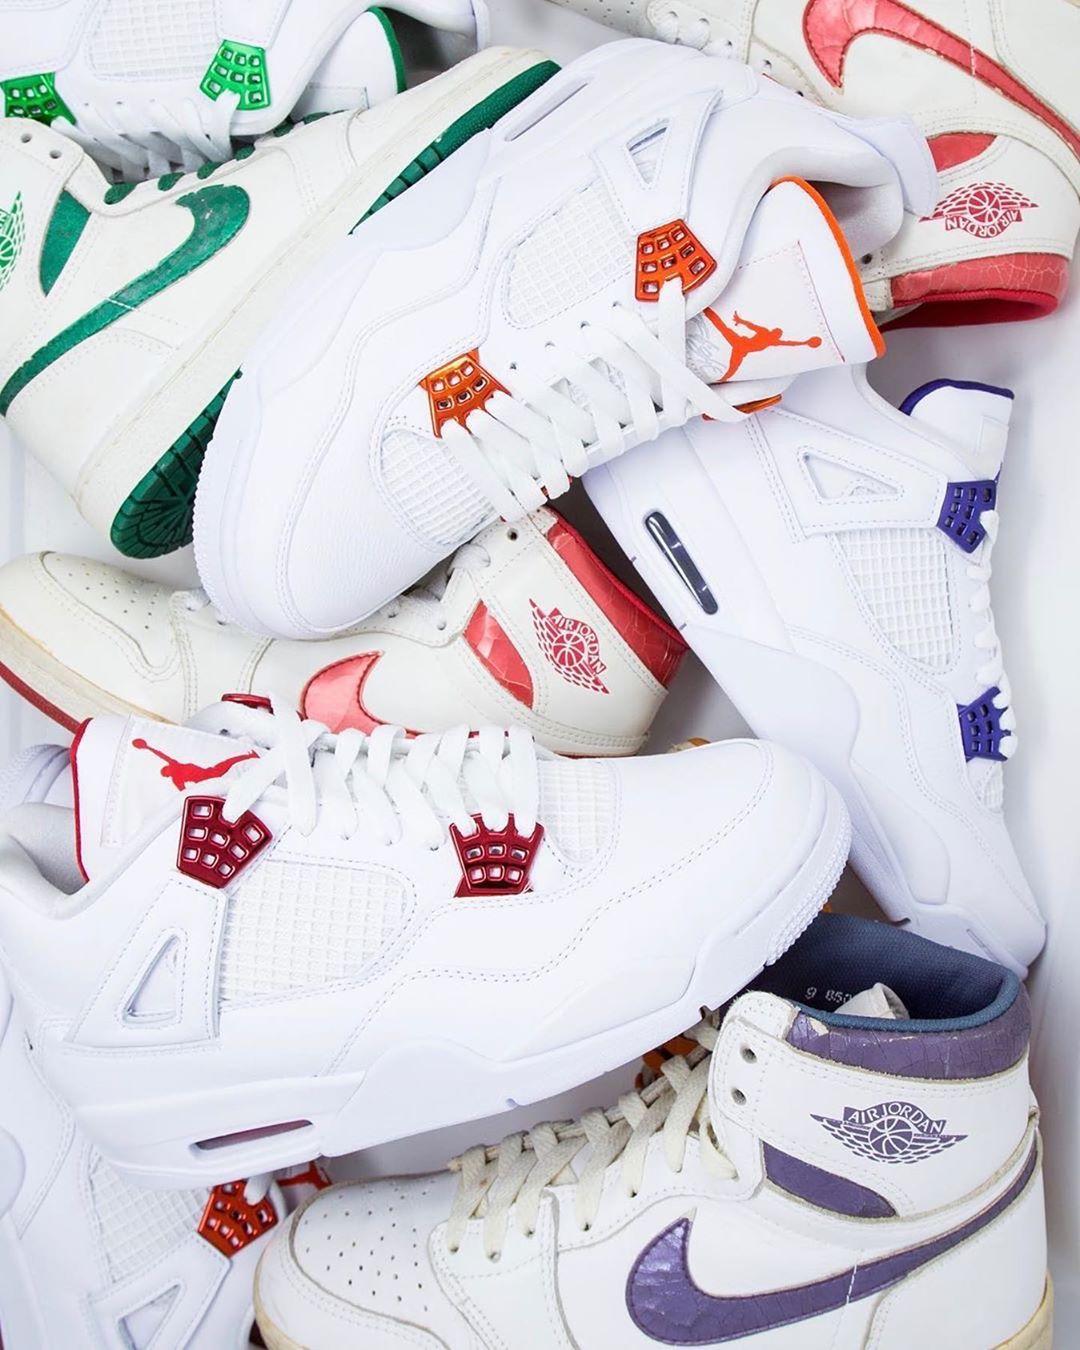 Air Jordan 4,AJ4,Orange Metall  纯白金属 AJ4 套装即将发售!第一款官网链接刚刚上线!